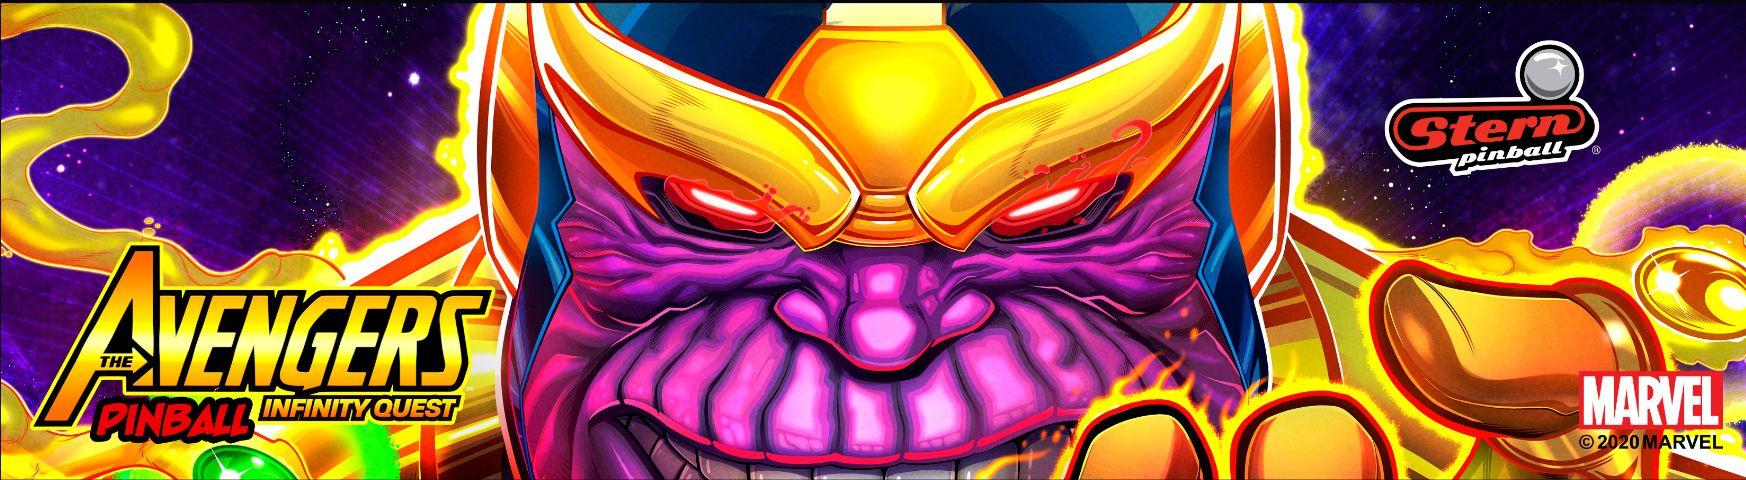 Flipper Avengers: Infinity Quest trafił do produkcji w Stern Pinball